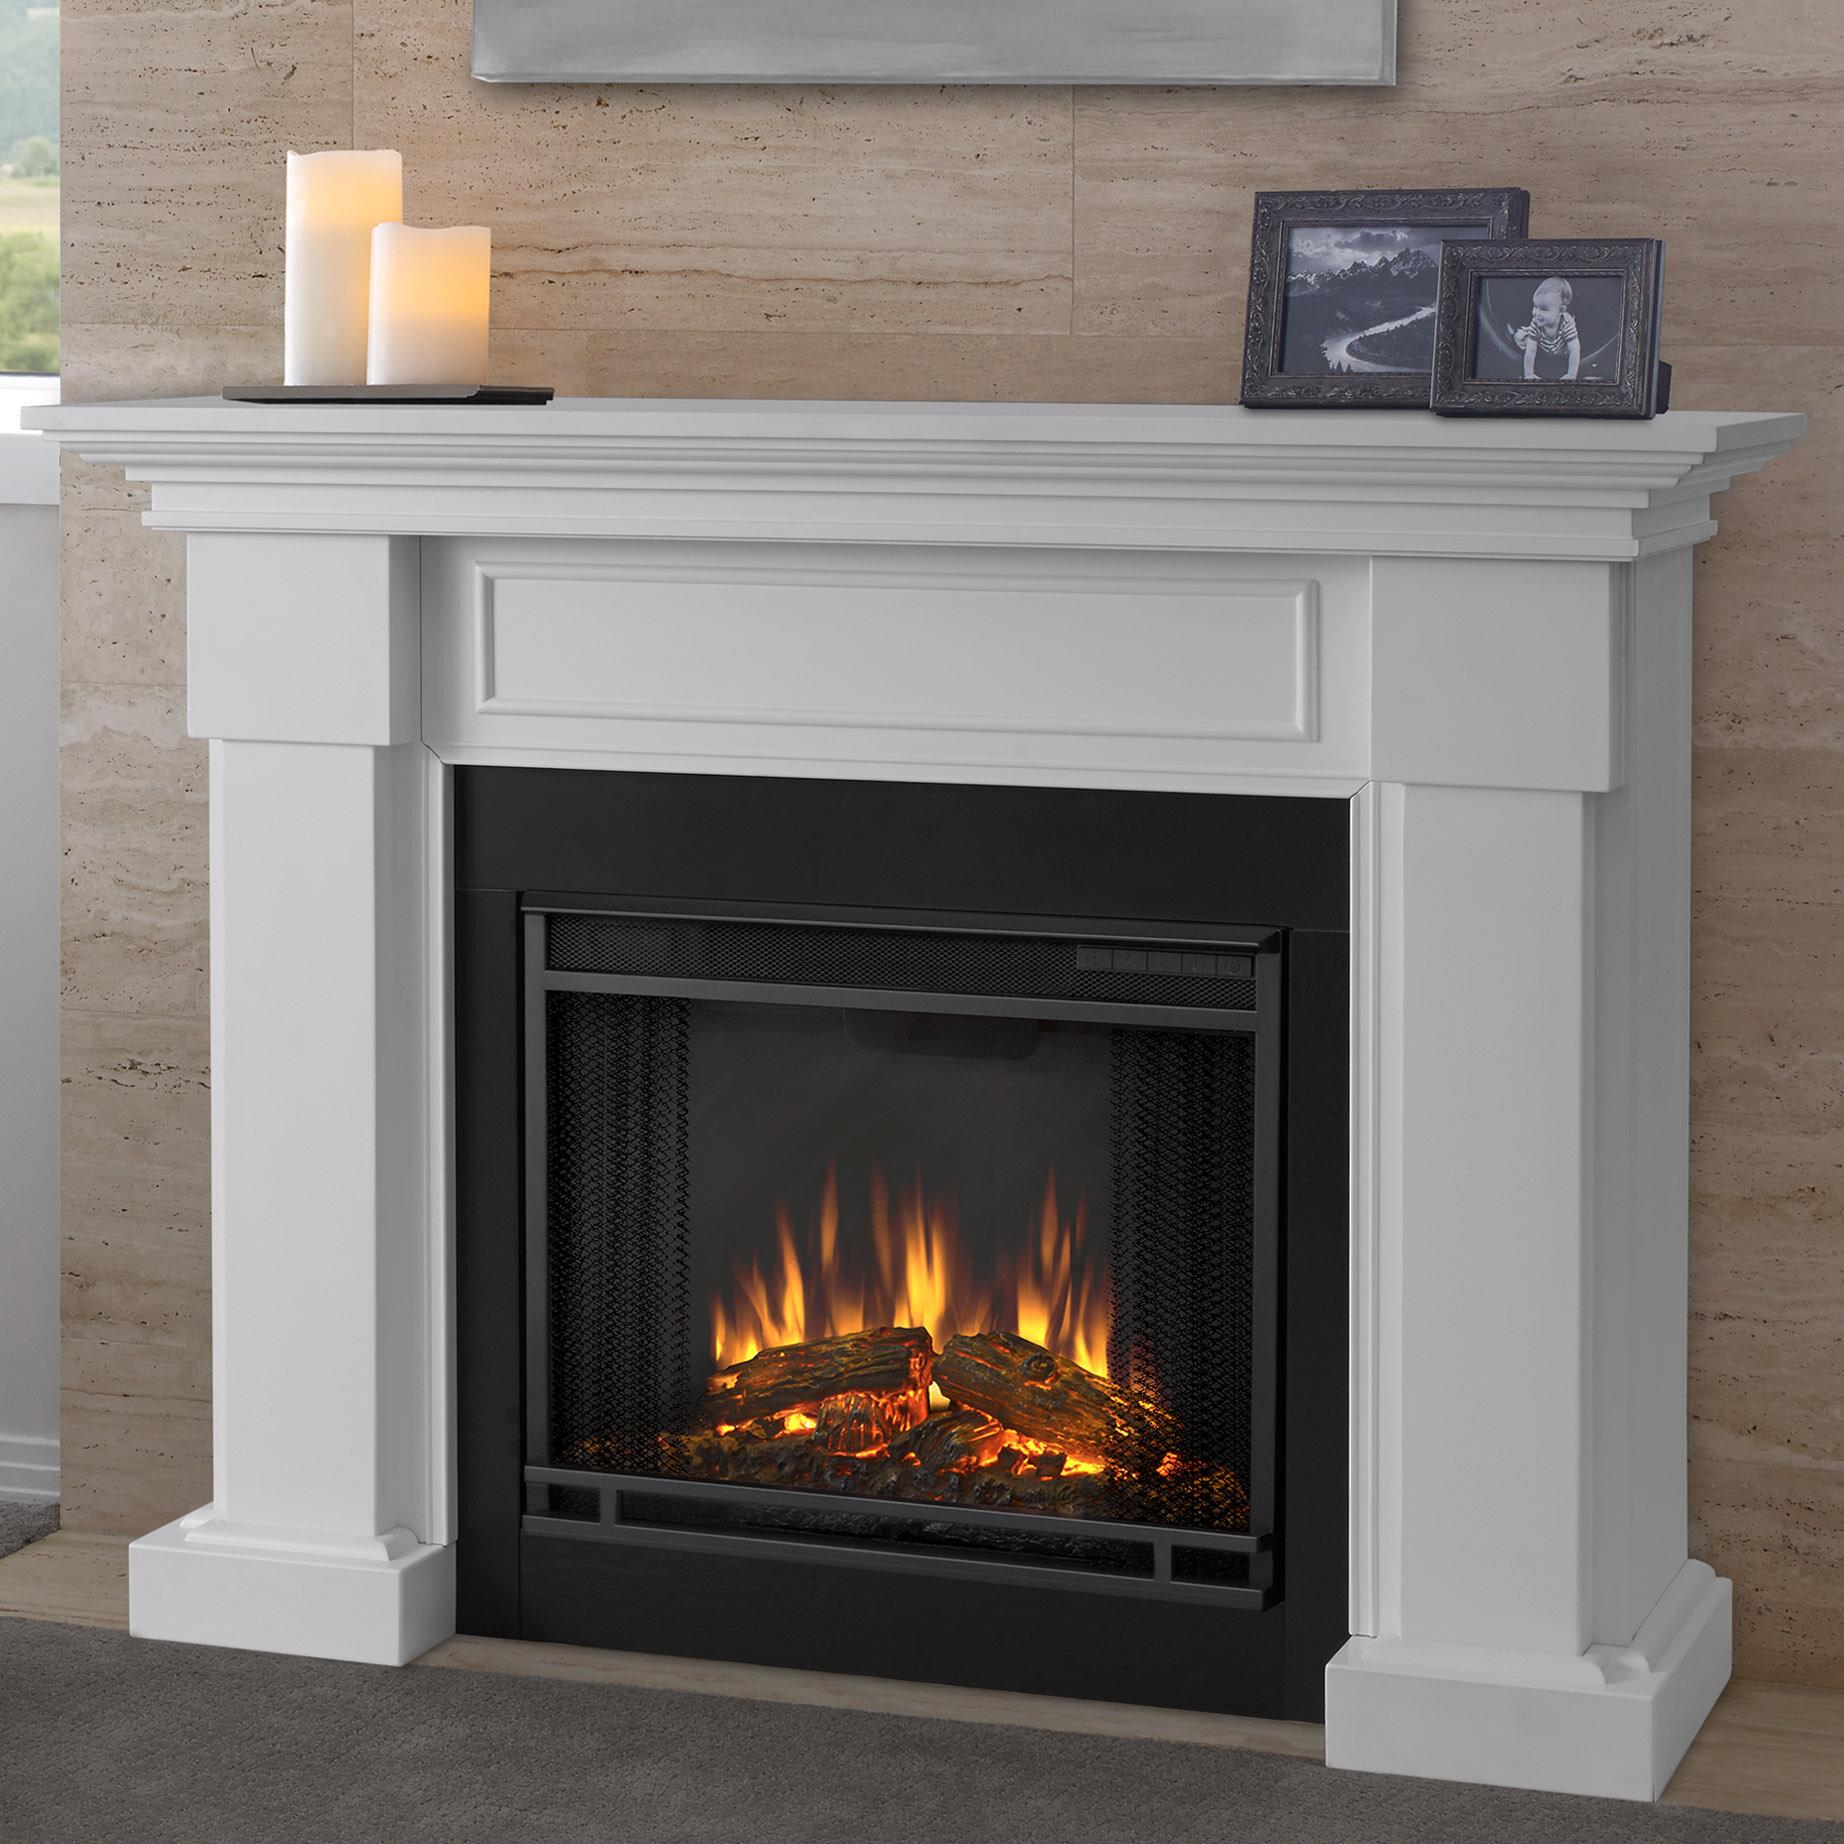 Real Flame Hillcrest Electric Fireplace U0026 Reviews | Wayfair